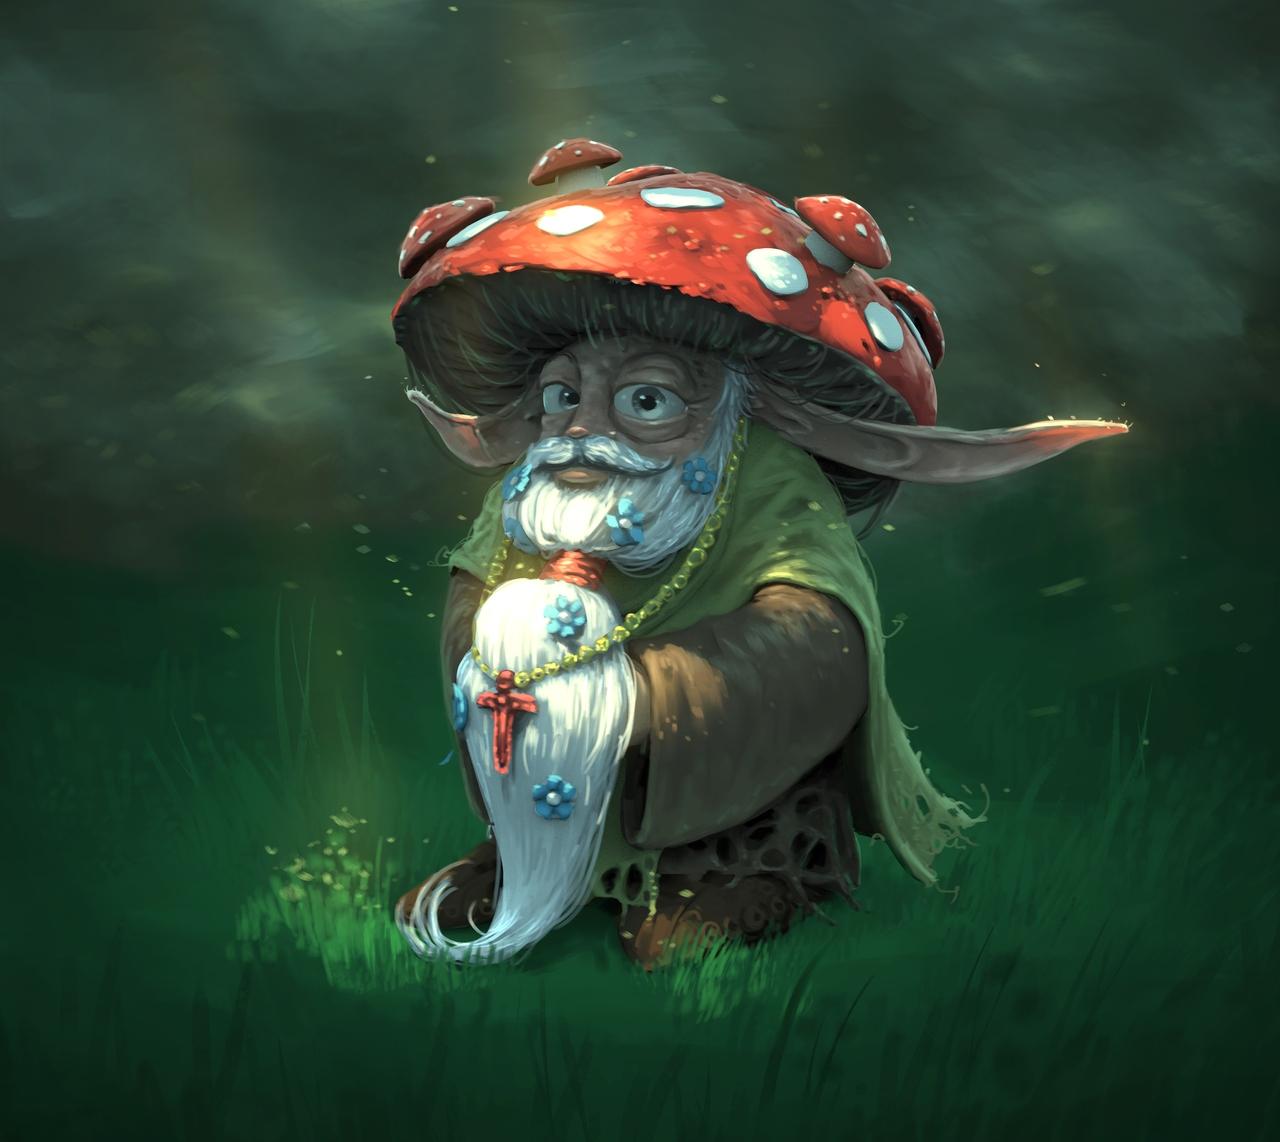 THE MUSHROOM MAN by dante-cg